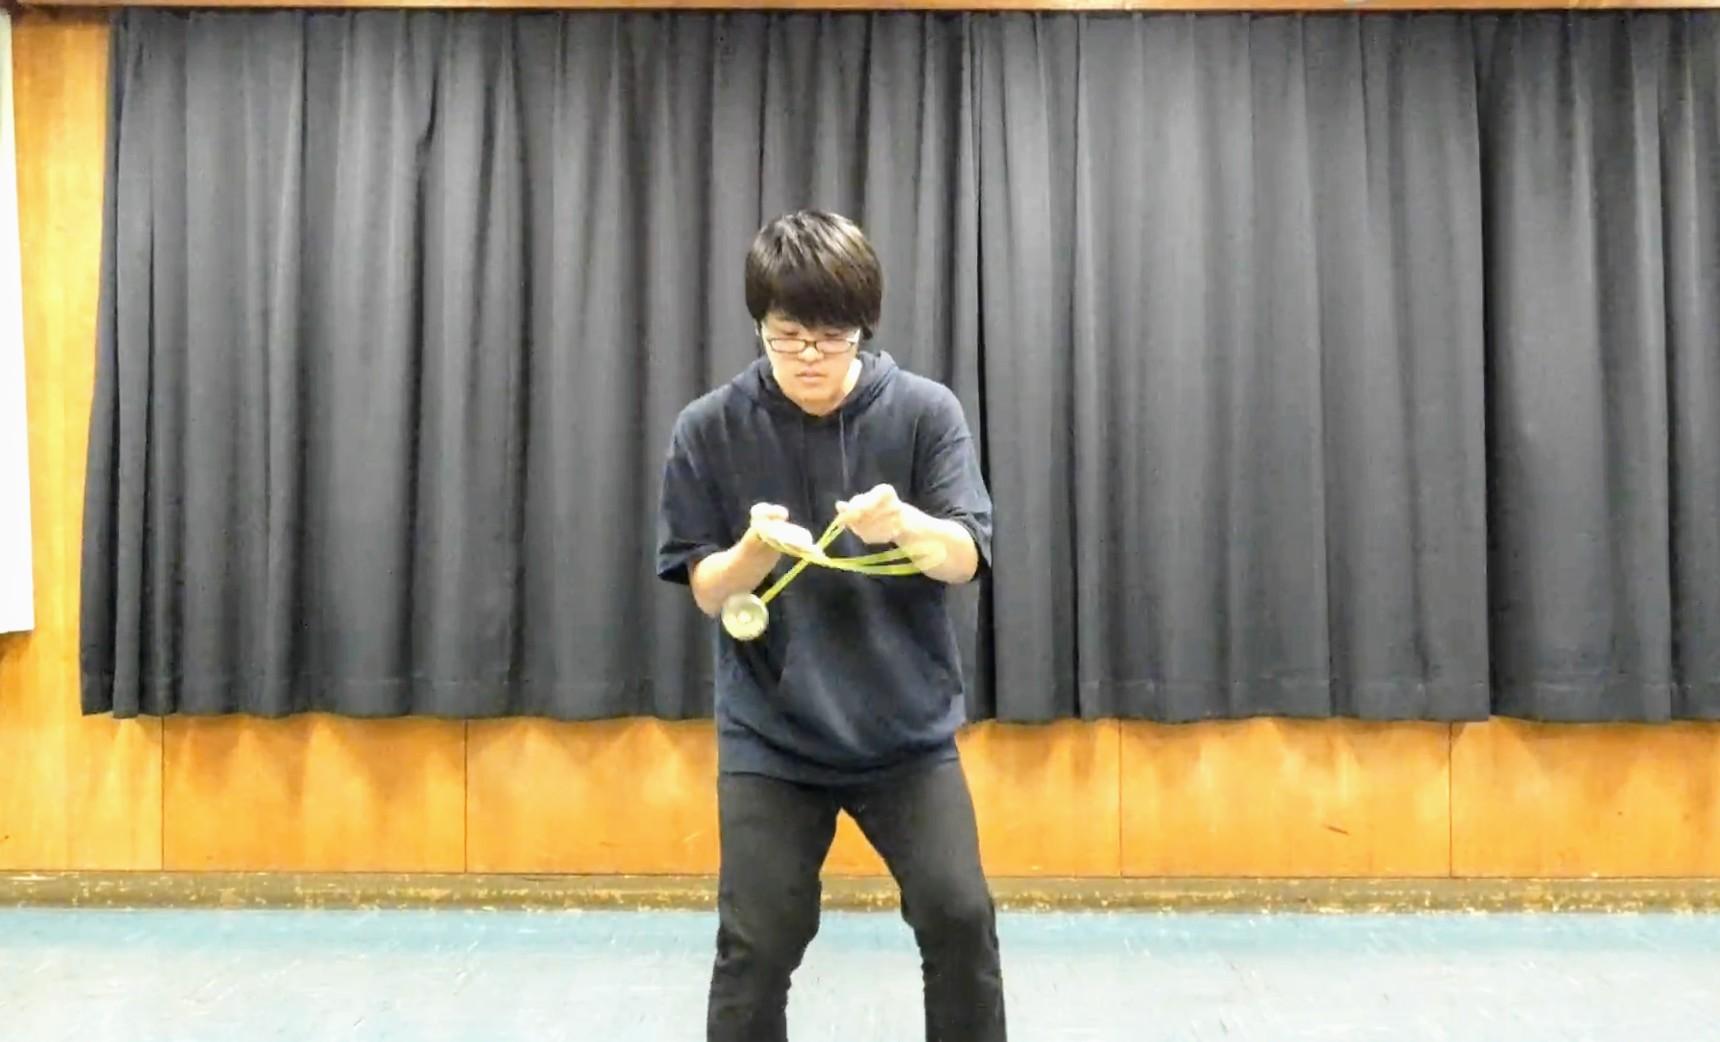 f:id:yoyo-hikarigaok:20190729194416j:image